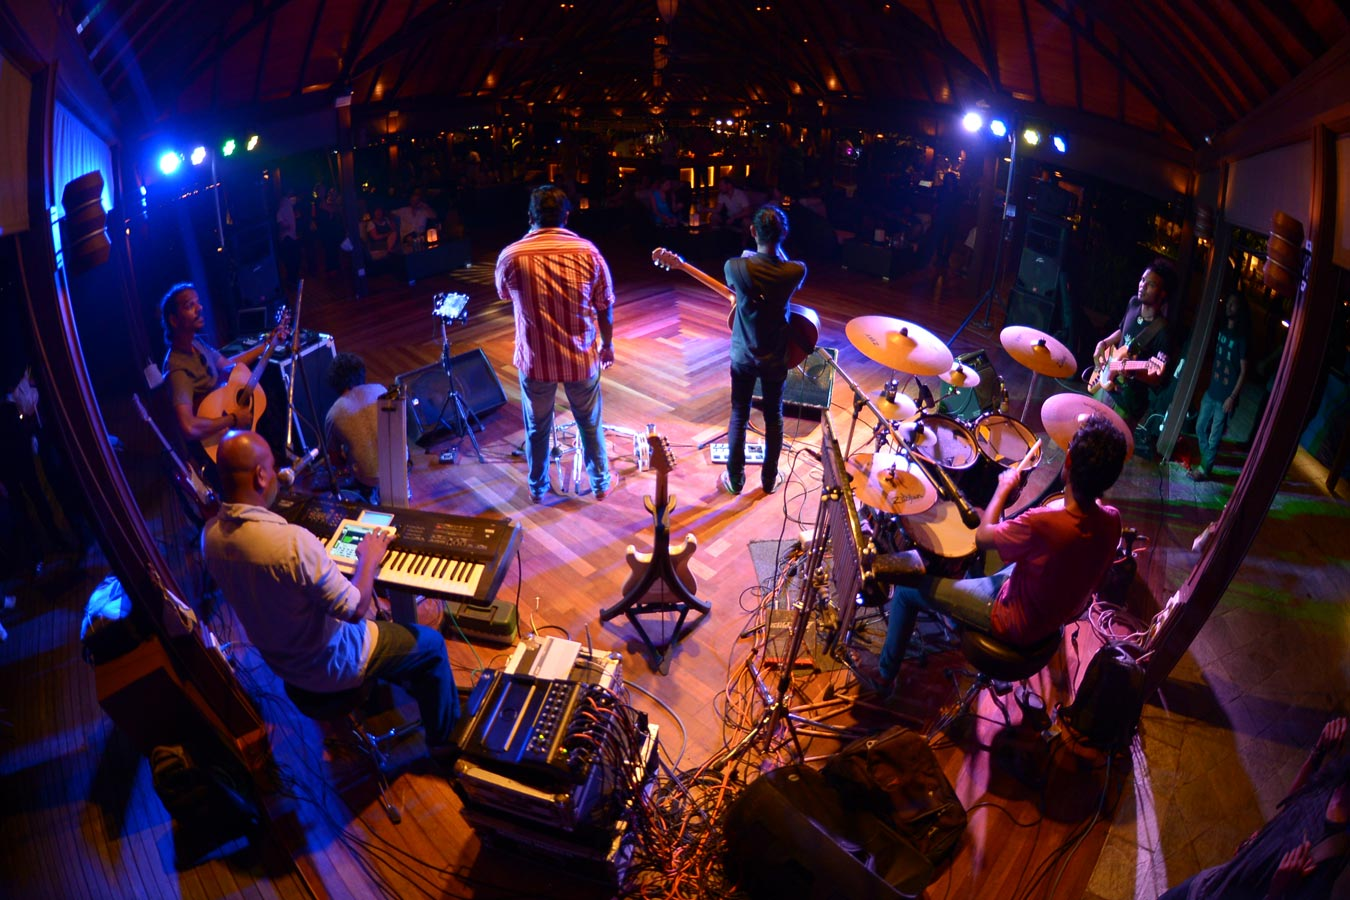 Maldives festivals celebrations at kurumba maldives resort for Music entertainment